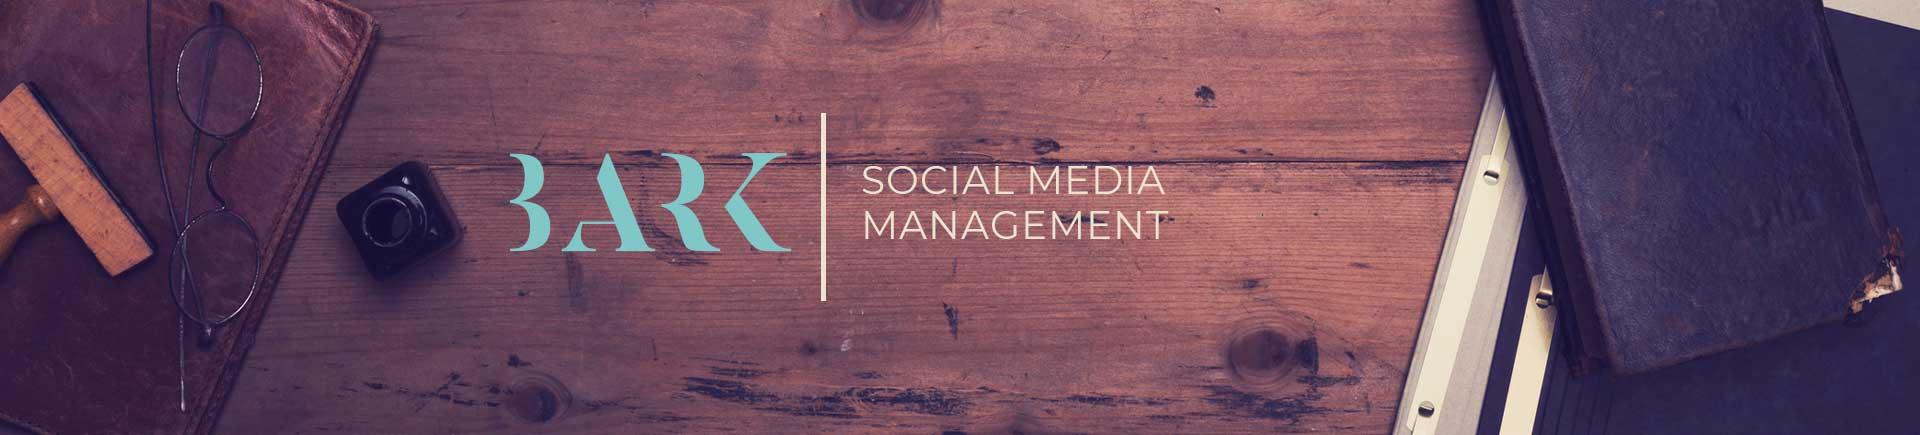 Social media management for businesses